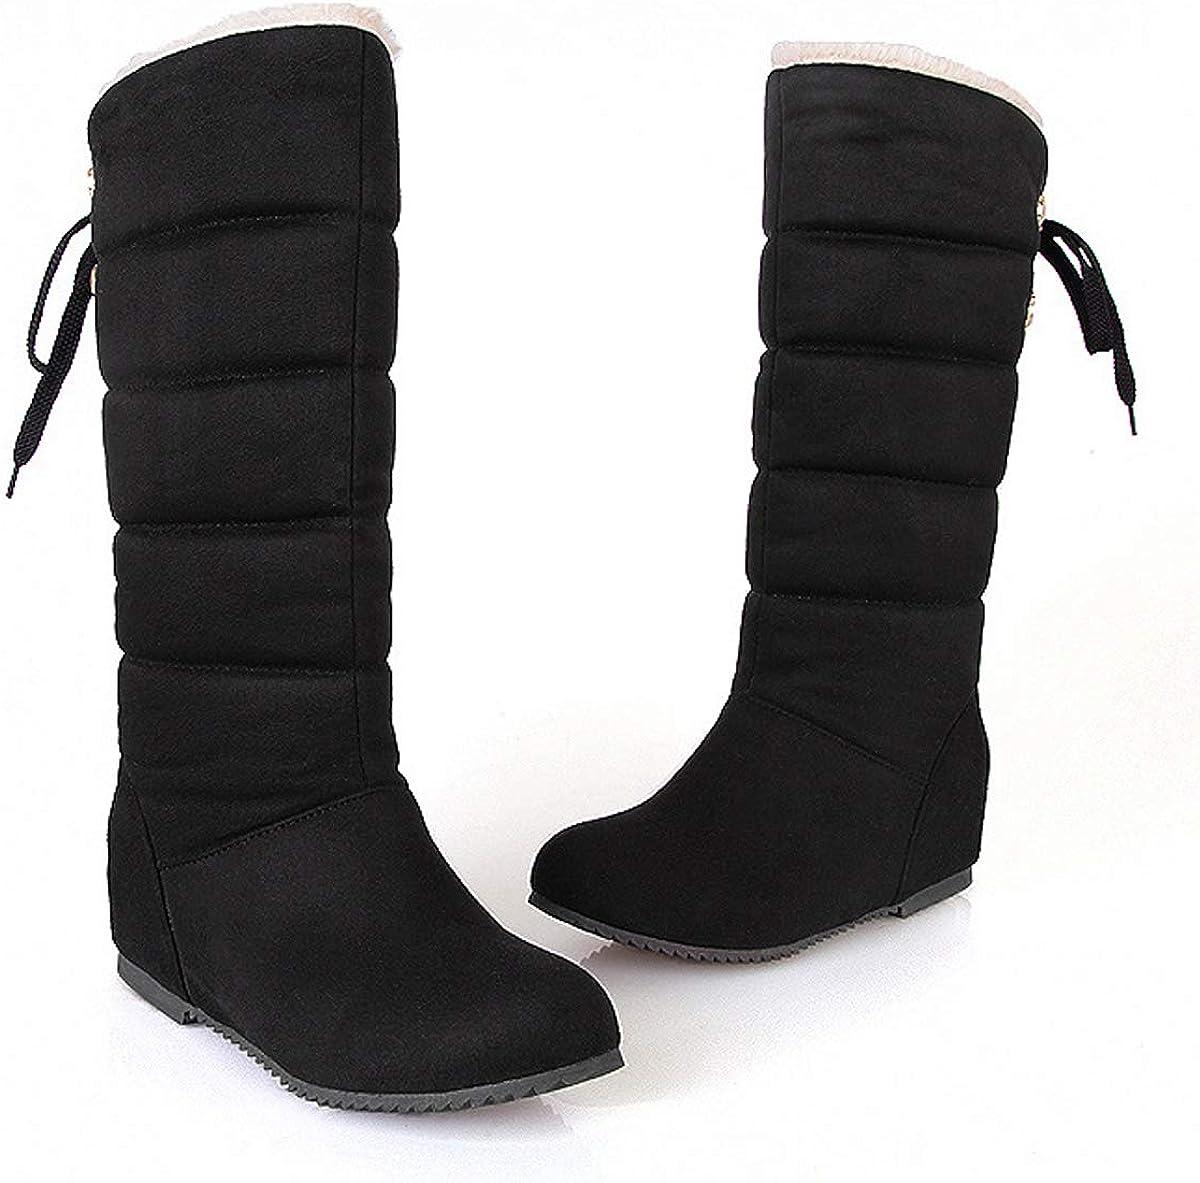 Dear Time Buckle Straps Women Snow Ankle Boots Platform Zipper Winter Booties by